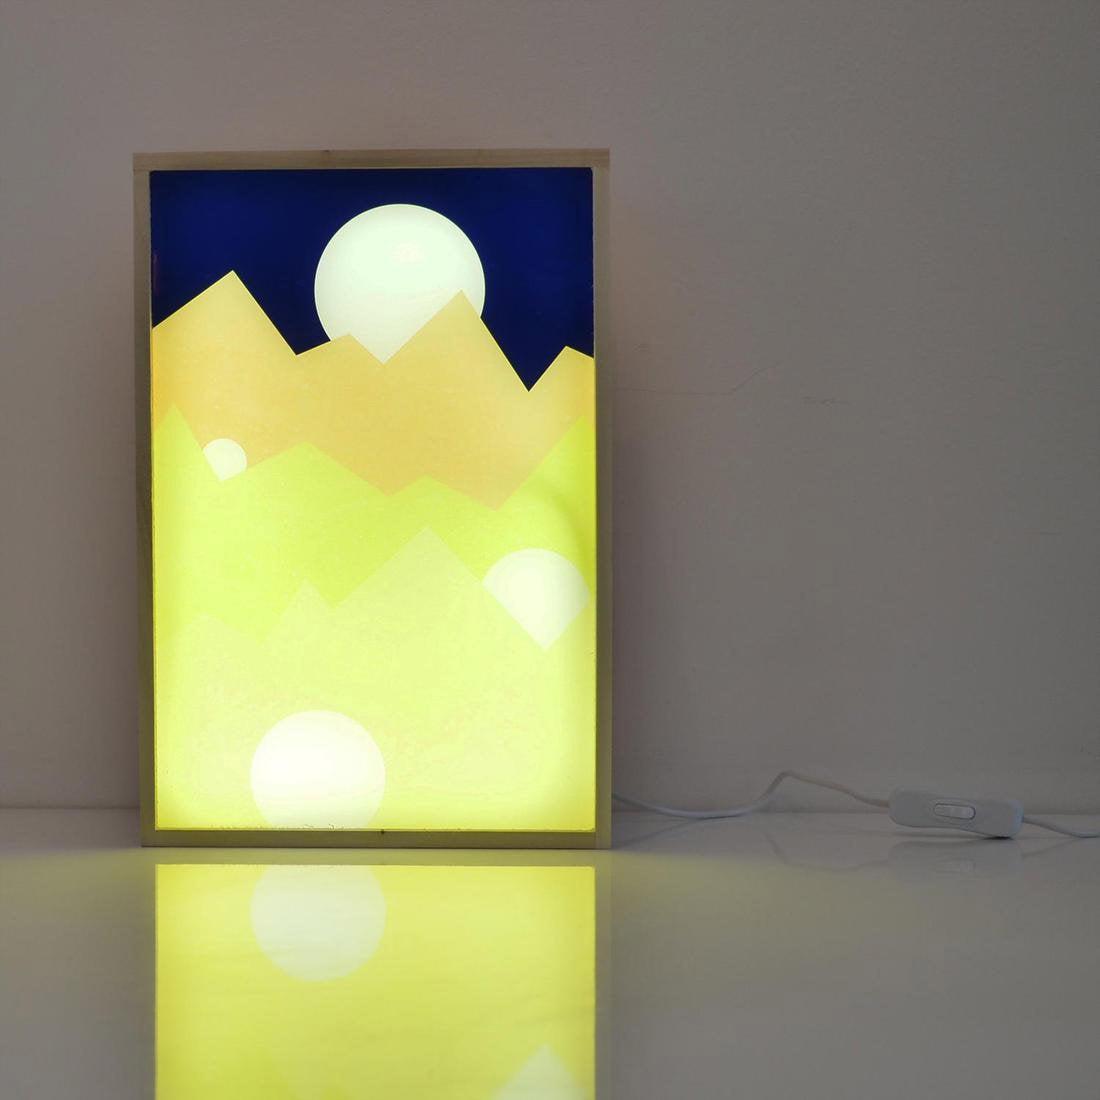 Boîte lumineuse, led intégrée Under the moonlight DADA LIGHT, multicolore, 9.6 W